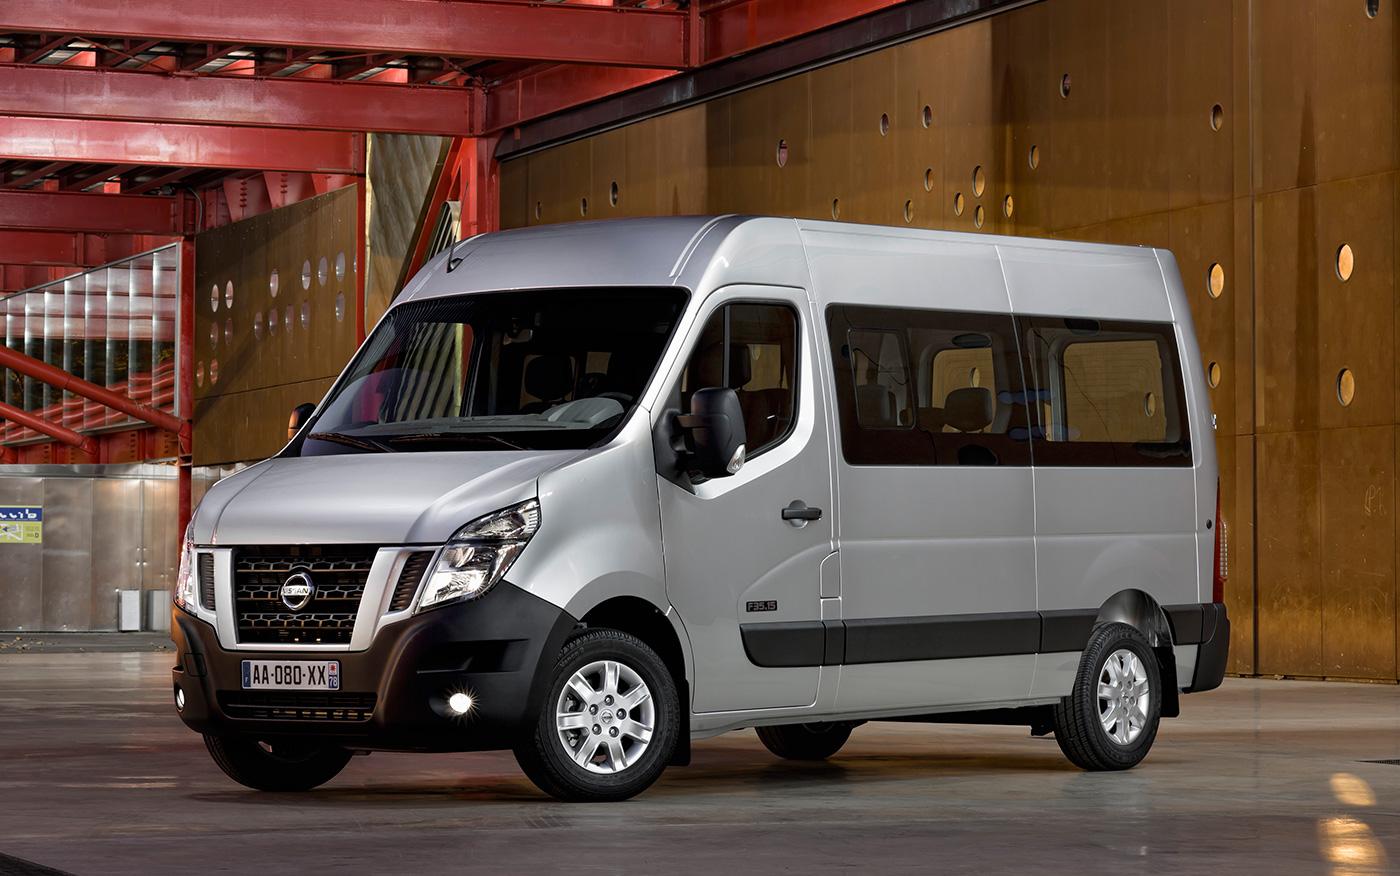 Nissan NV400 2.3 DCi 3300 L1 H1 SE 145ps FWD Start/stop